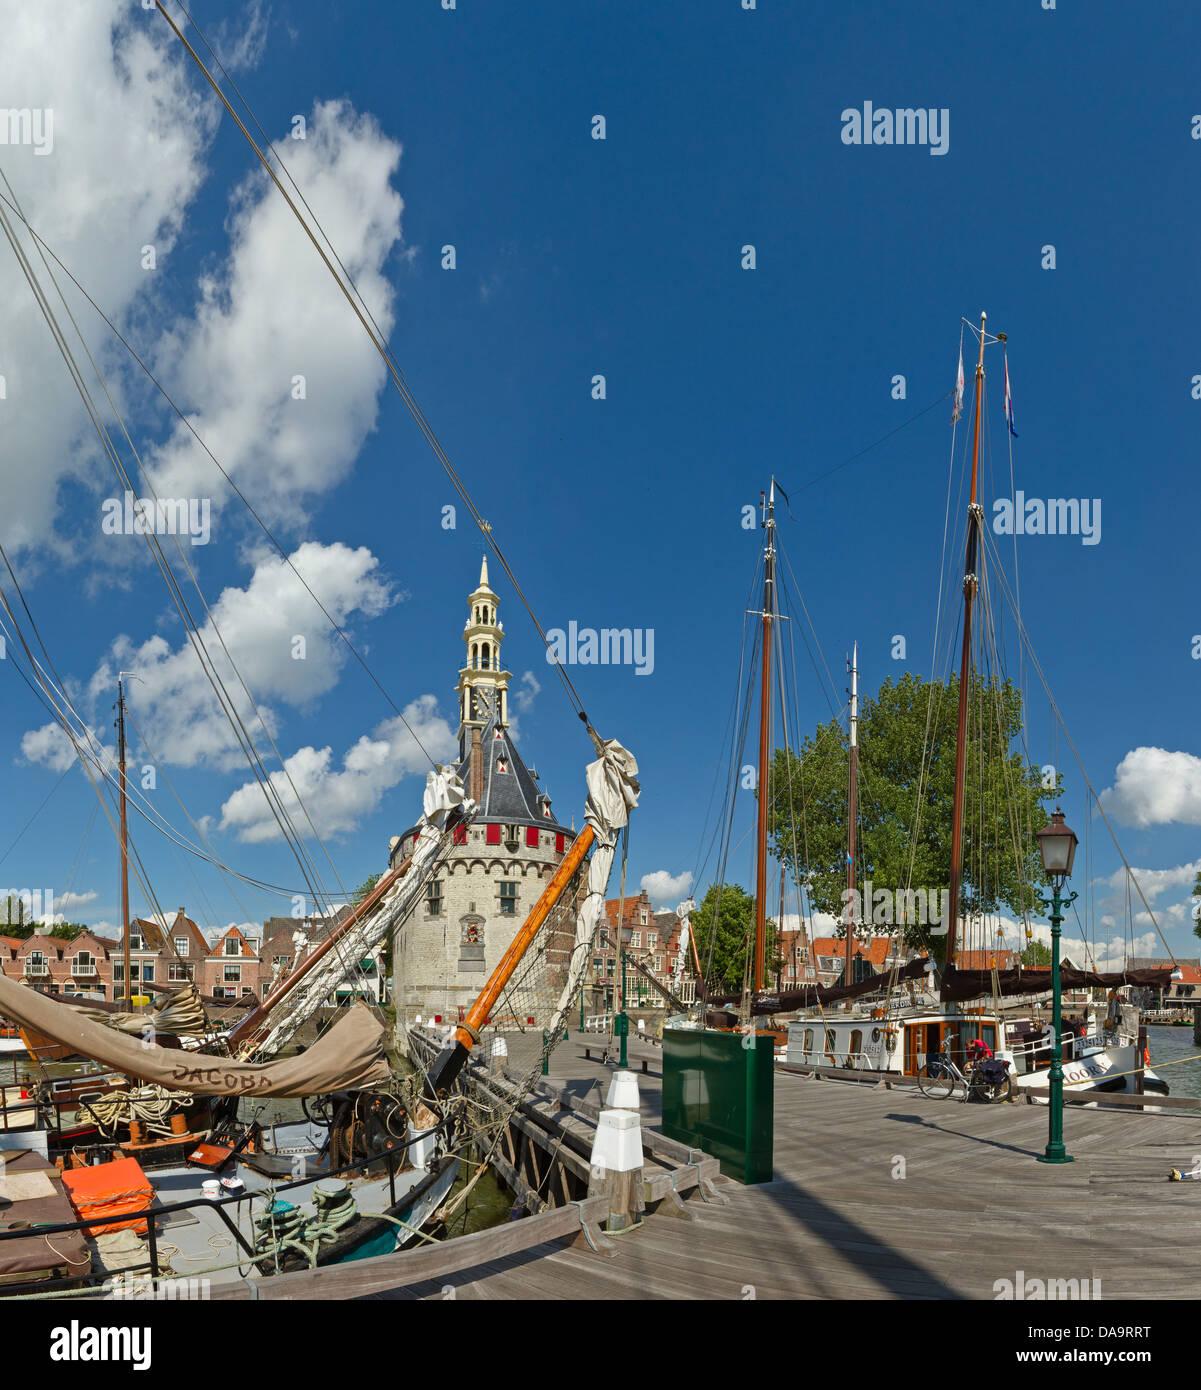 Netherlands, Holland, Europe, Hoorn, Sailing, vessels, ship, Main tower, tower, city, village, summer, ships, boat, - Stock Image